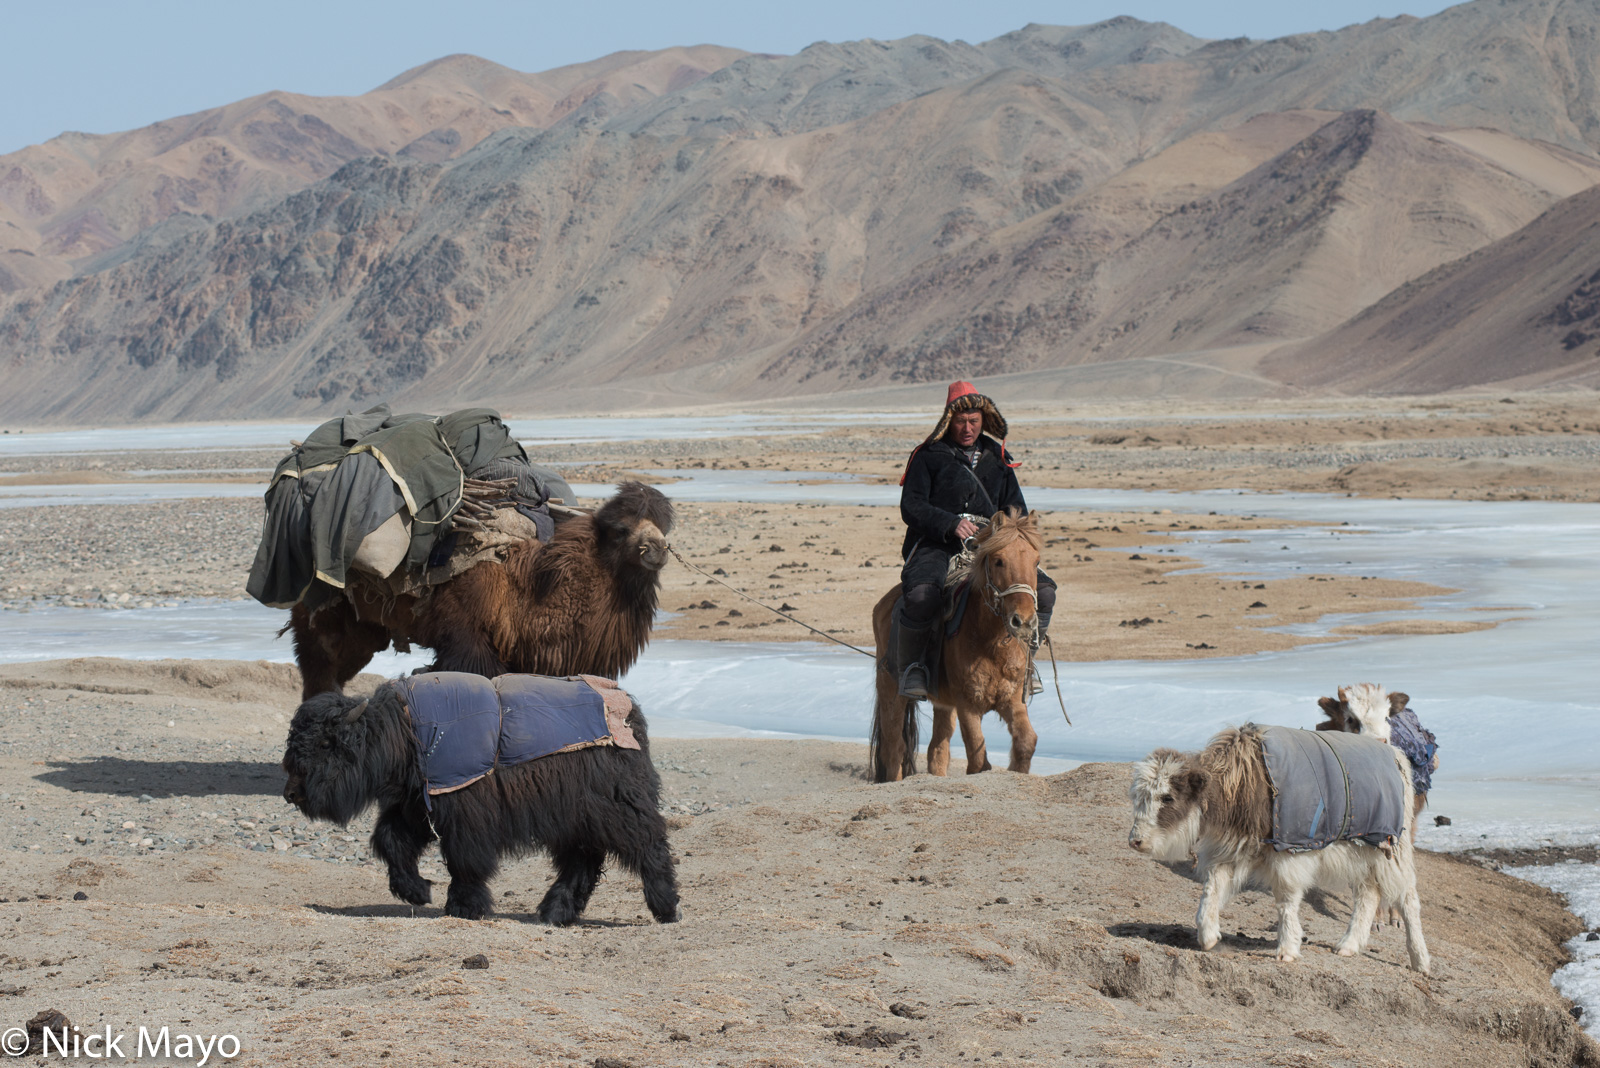 Bayan-Ölgii, Camel, Horse, Kazakh, Mongolia, Pack Animal, Yak, photo